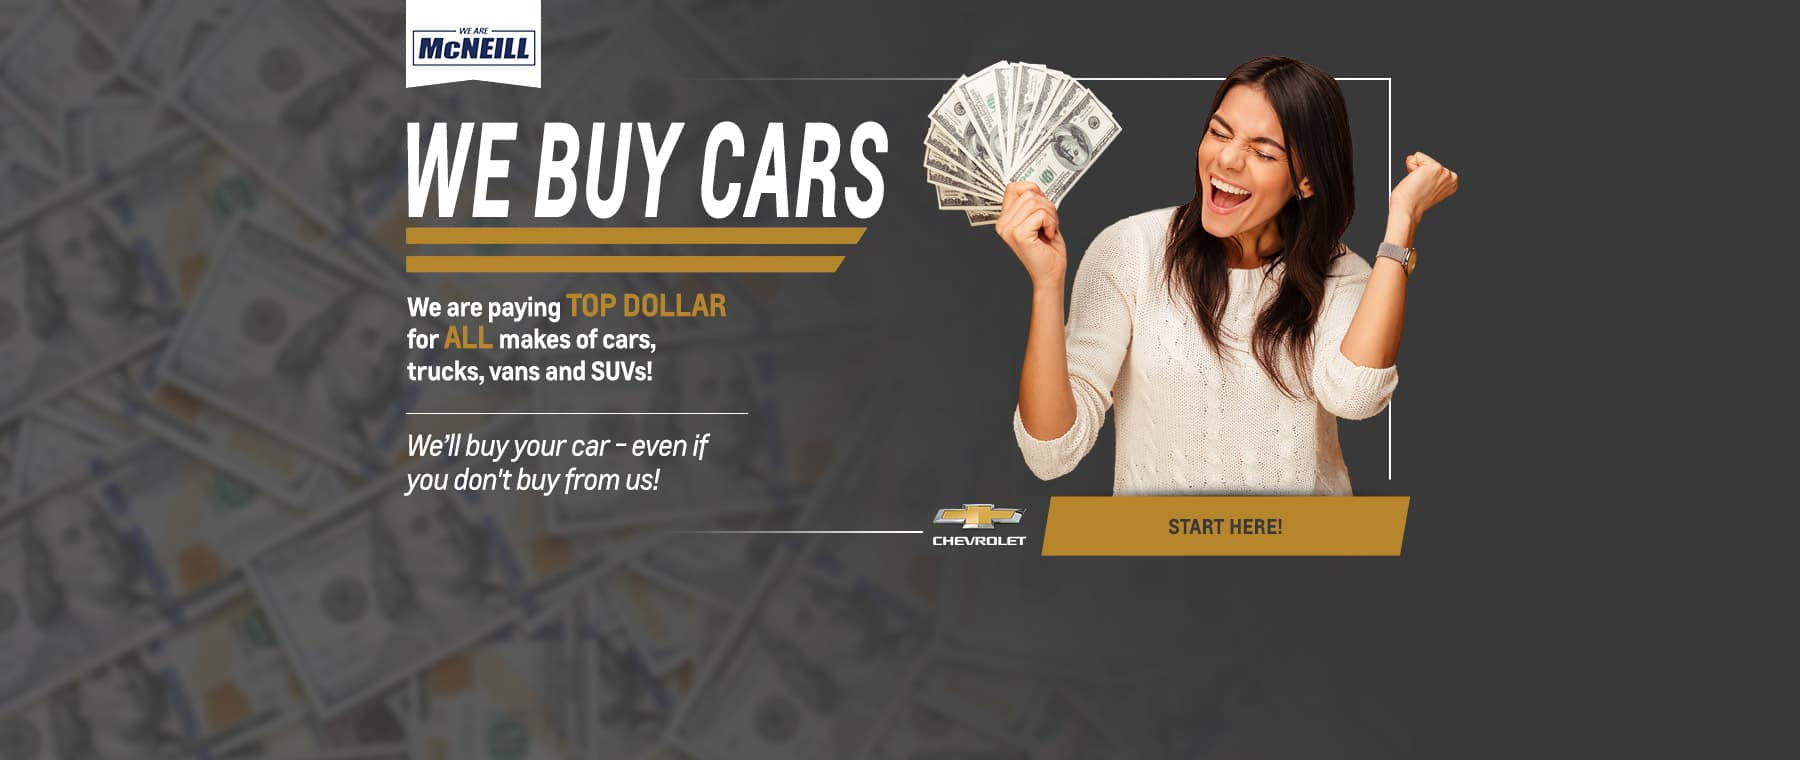 2021-09-We-Buy-Cars_1800x760